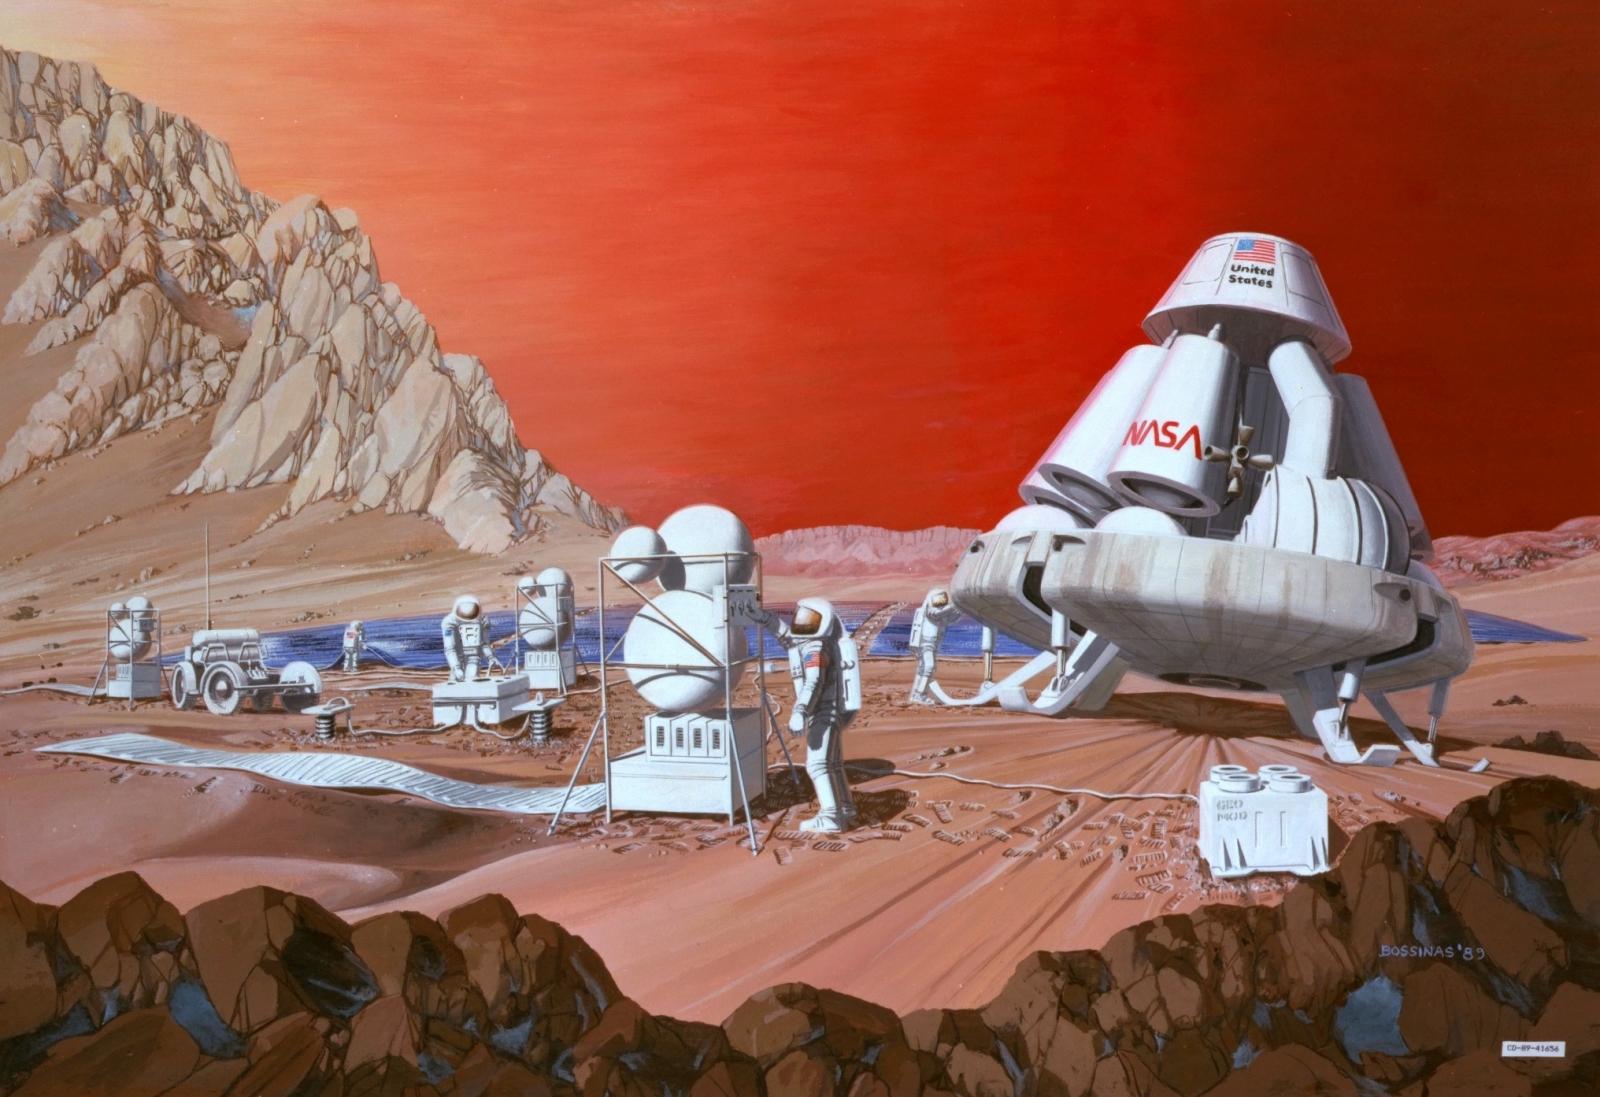 1989 artist conceptualisation of a Mars mission